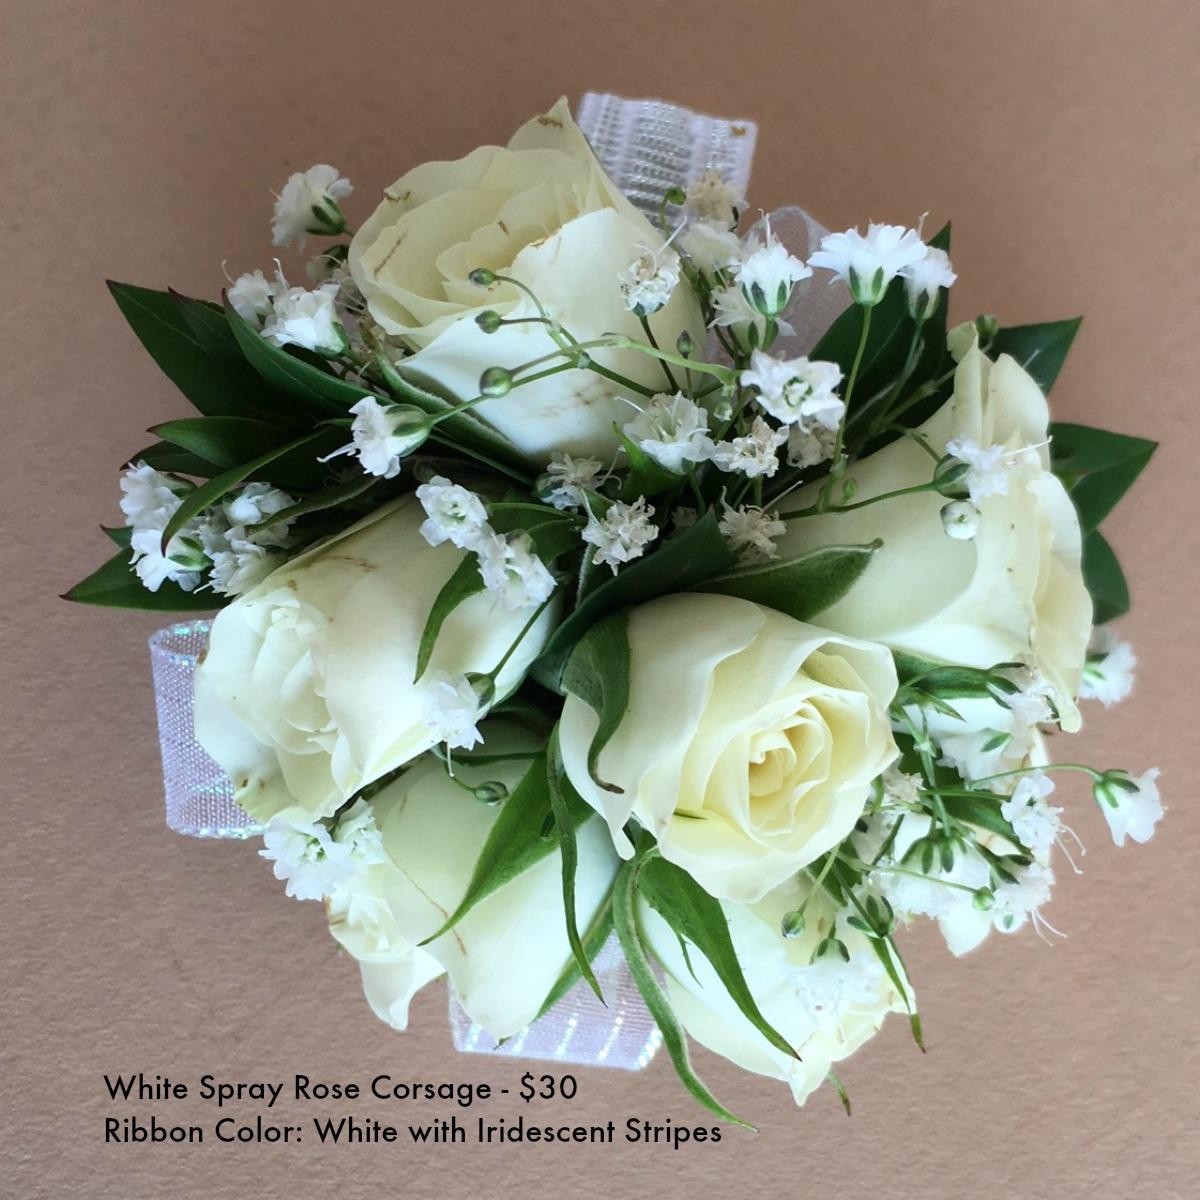 whitesprayrosecorsage.jpg